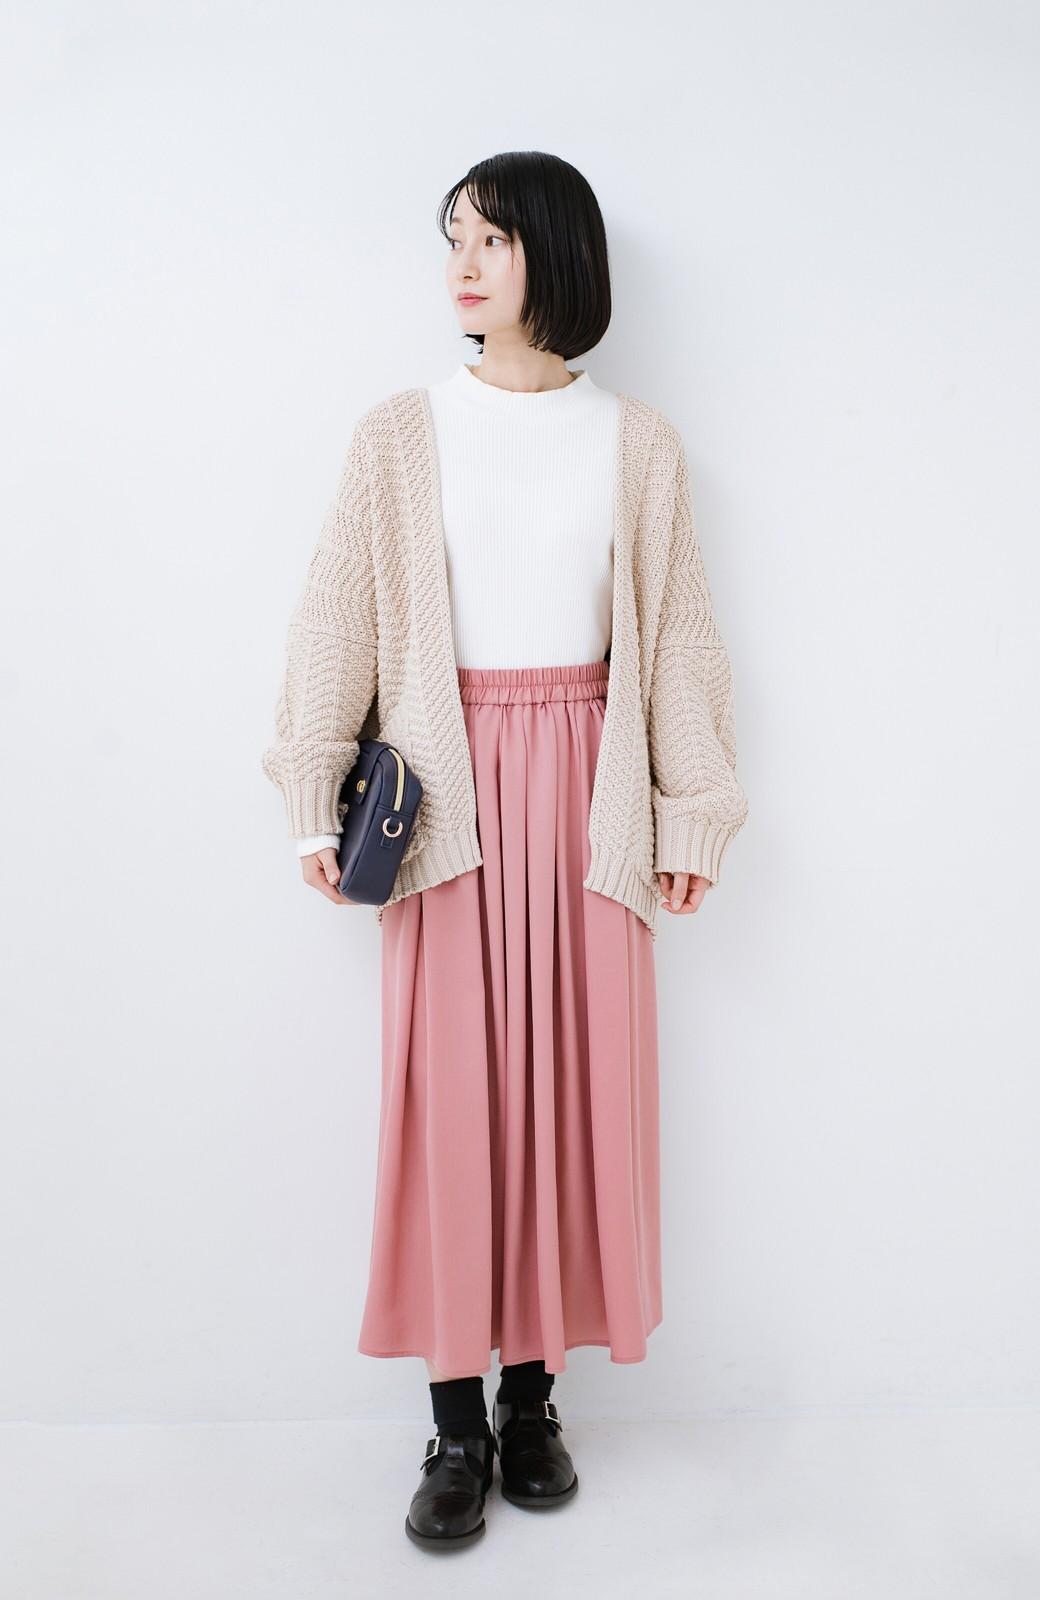 haco! きれいなお姉さんになれる気がするミモレ丈フレアースカート <ピンク>の商品写真11